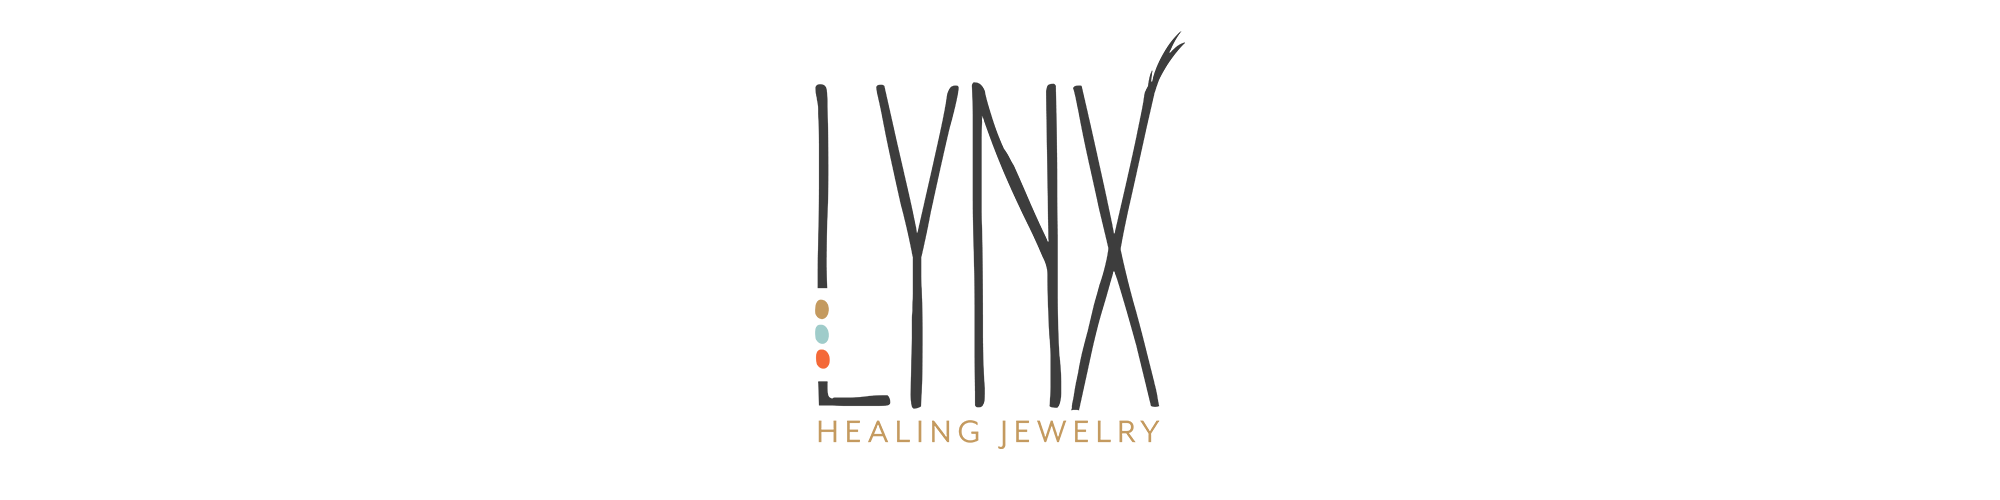 lynx_long.png